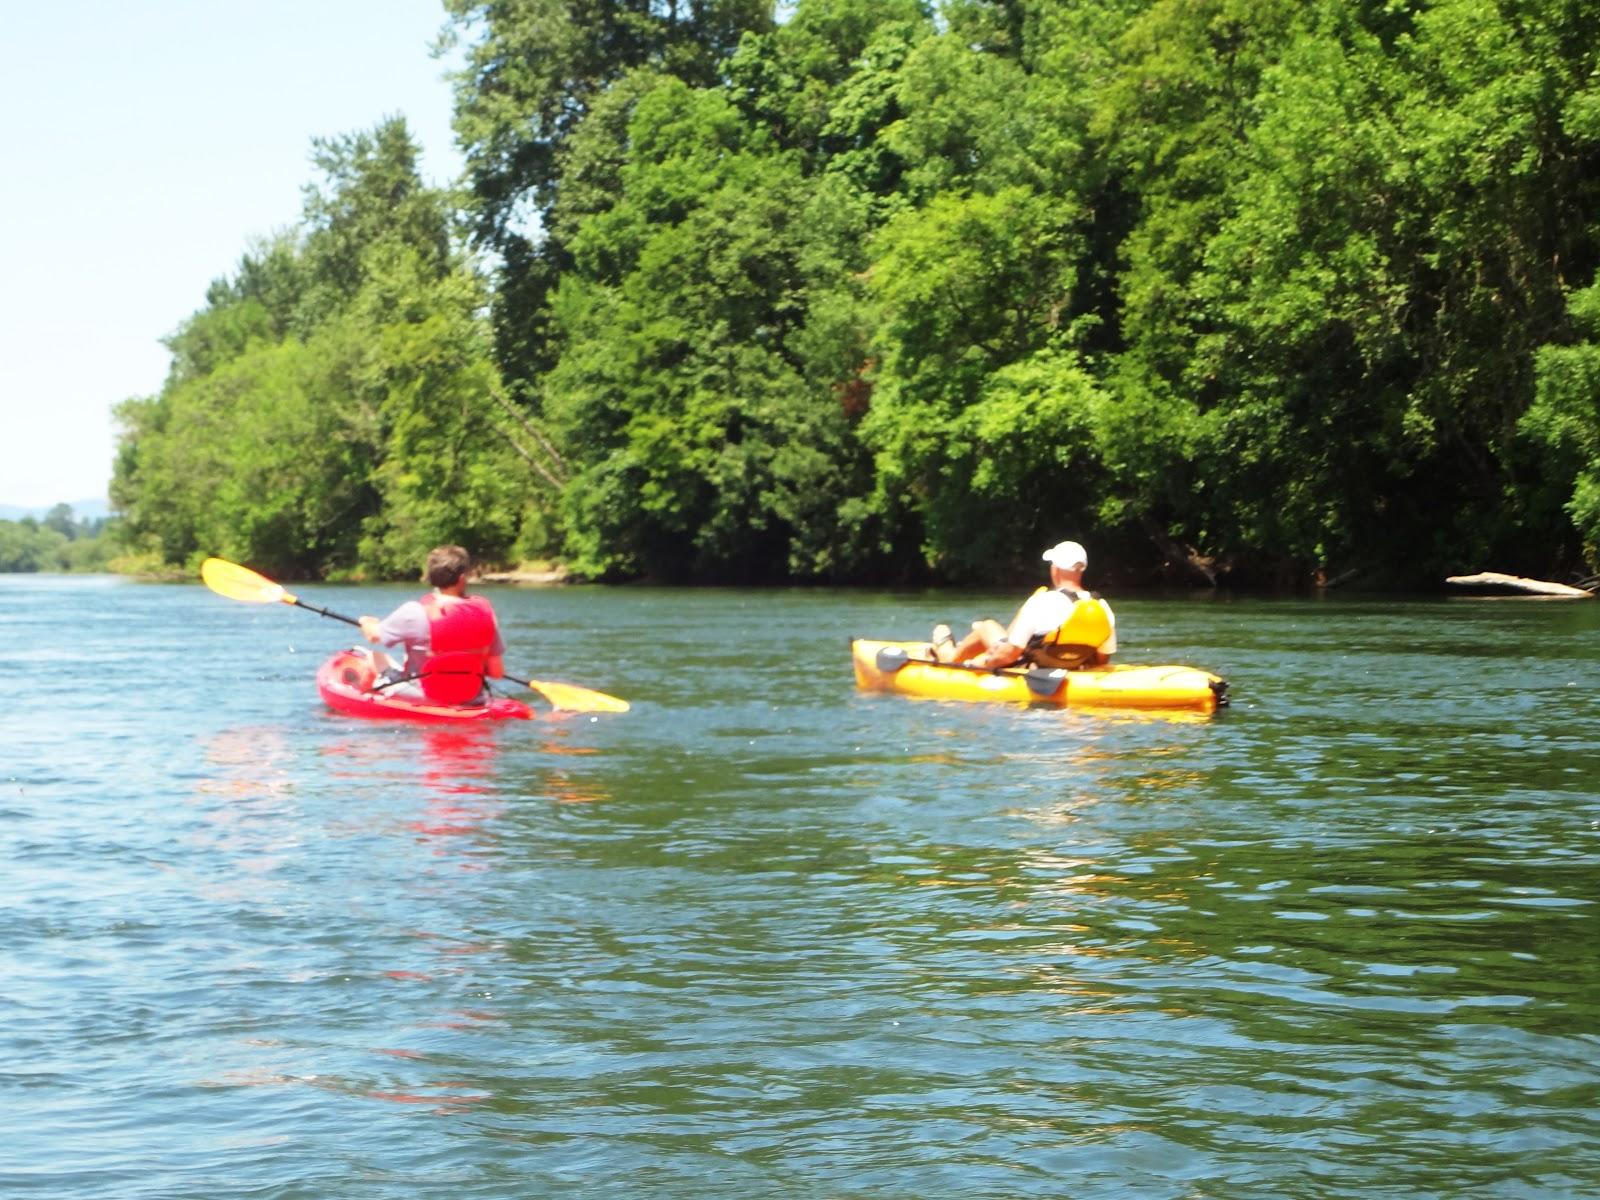 http://4.bp.blogspot.com/-zICiYnkqW-c/UAXKq-fqfsI/AAAAAAAADDc/L5focHEAKHE/s1600/phil+and+vic+kayaking.jpg